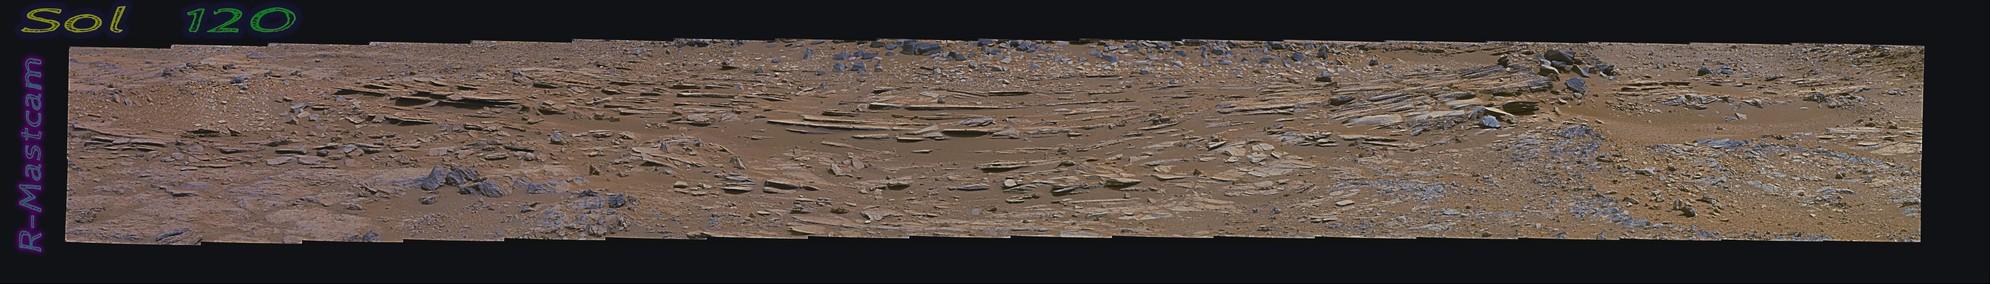 Curiosity Sol 120 PDS -  Drive toward